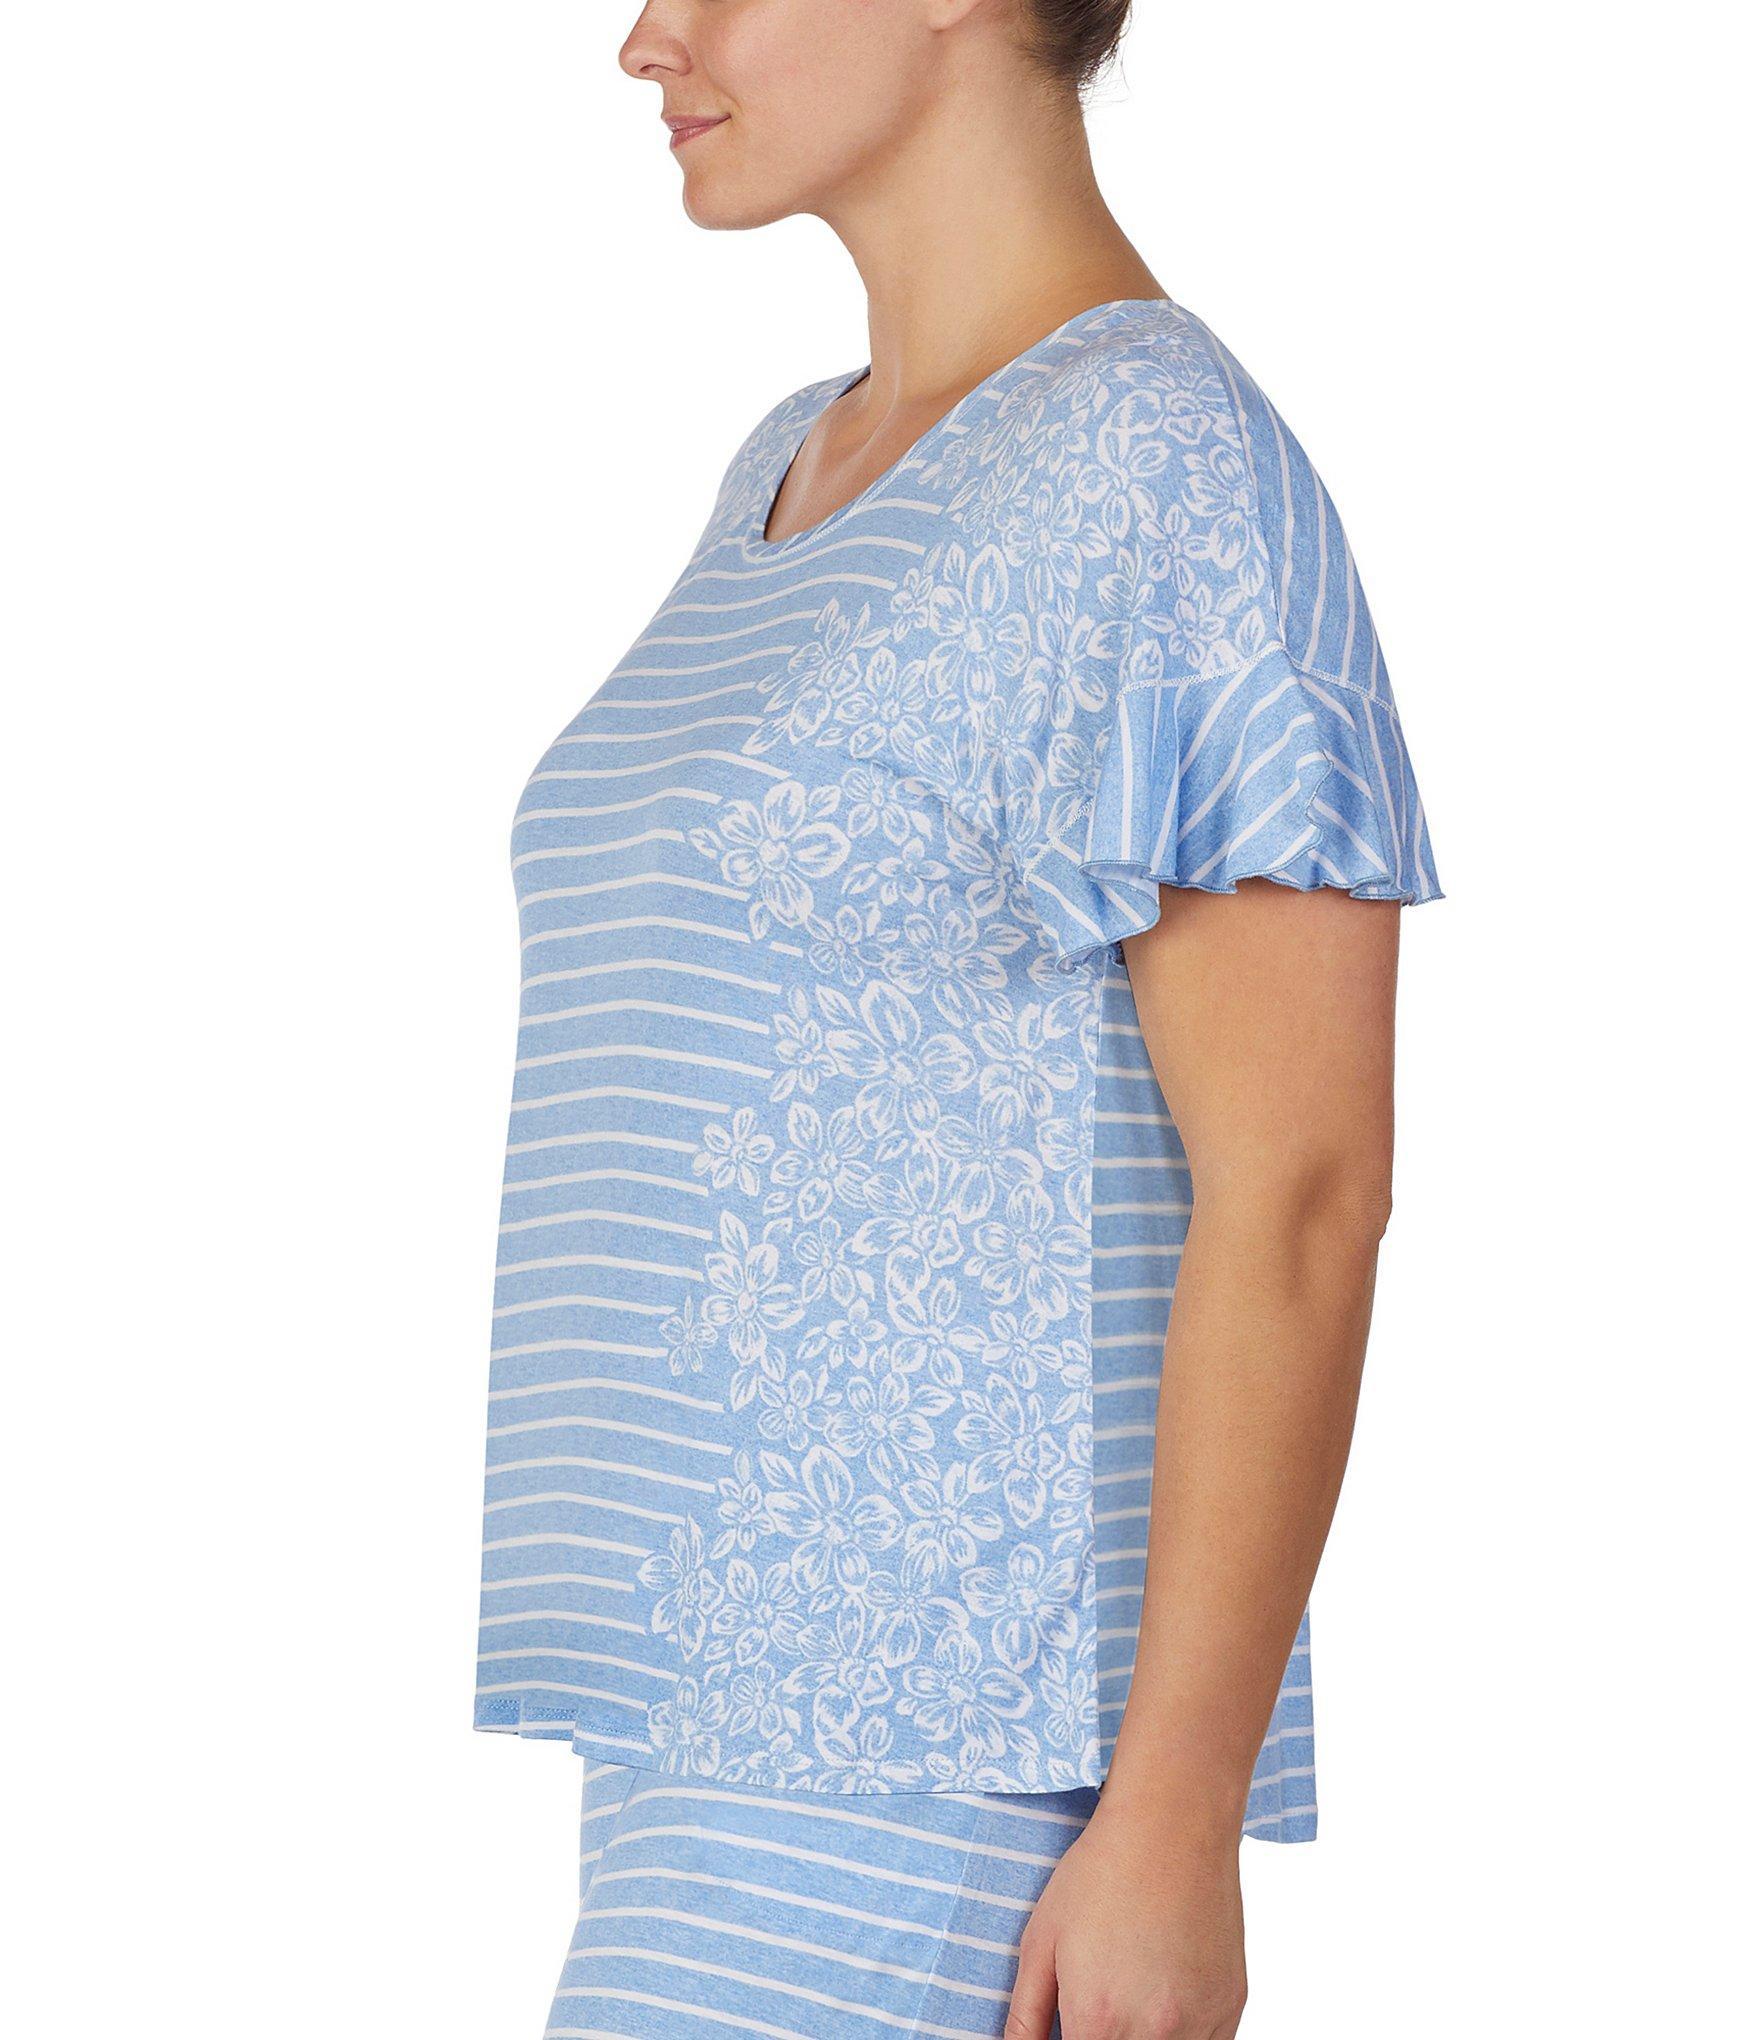 a5b542a45f Kensie - Blue Plus Floral   Stripe Print Jersey Knit Sleep Top - Lyst. View  fullscreen